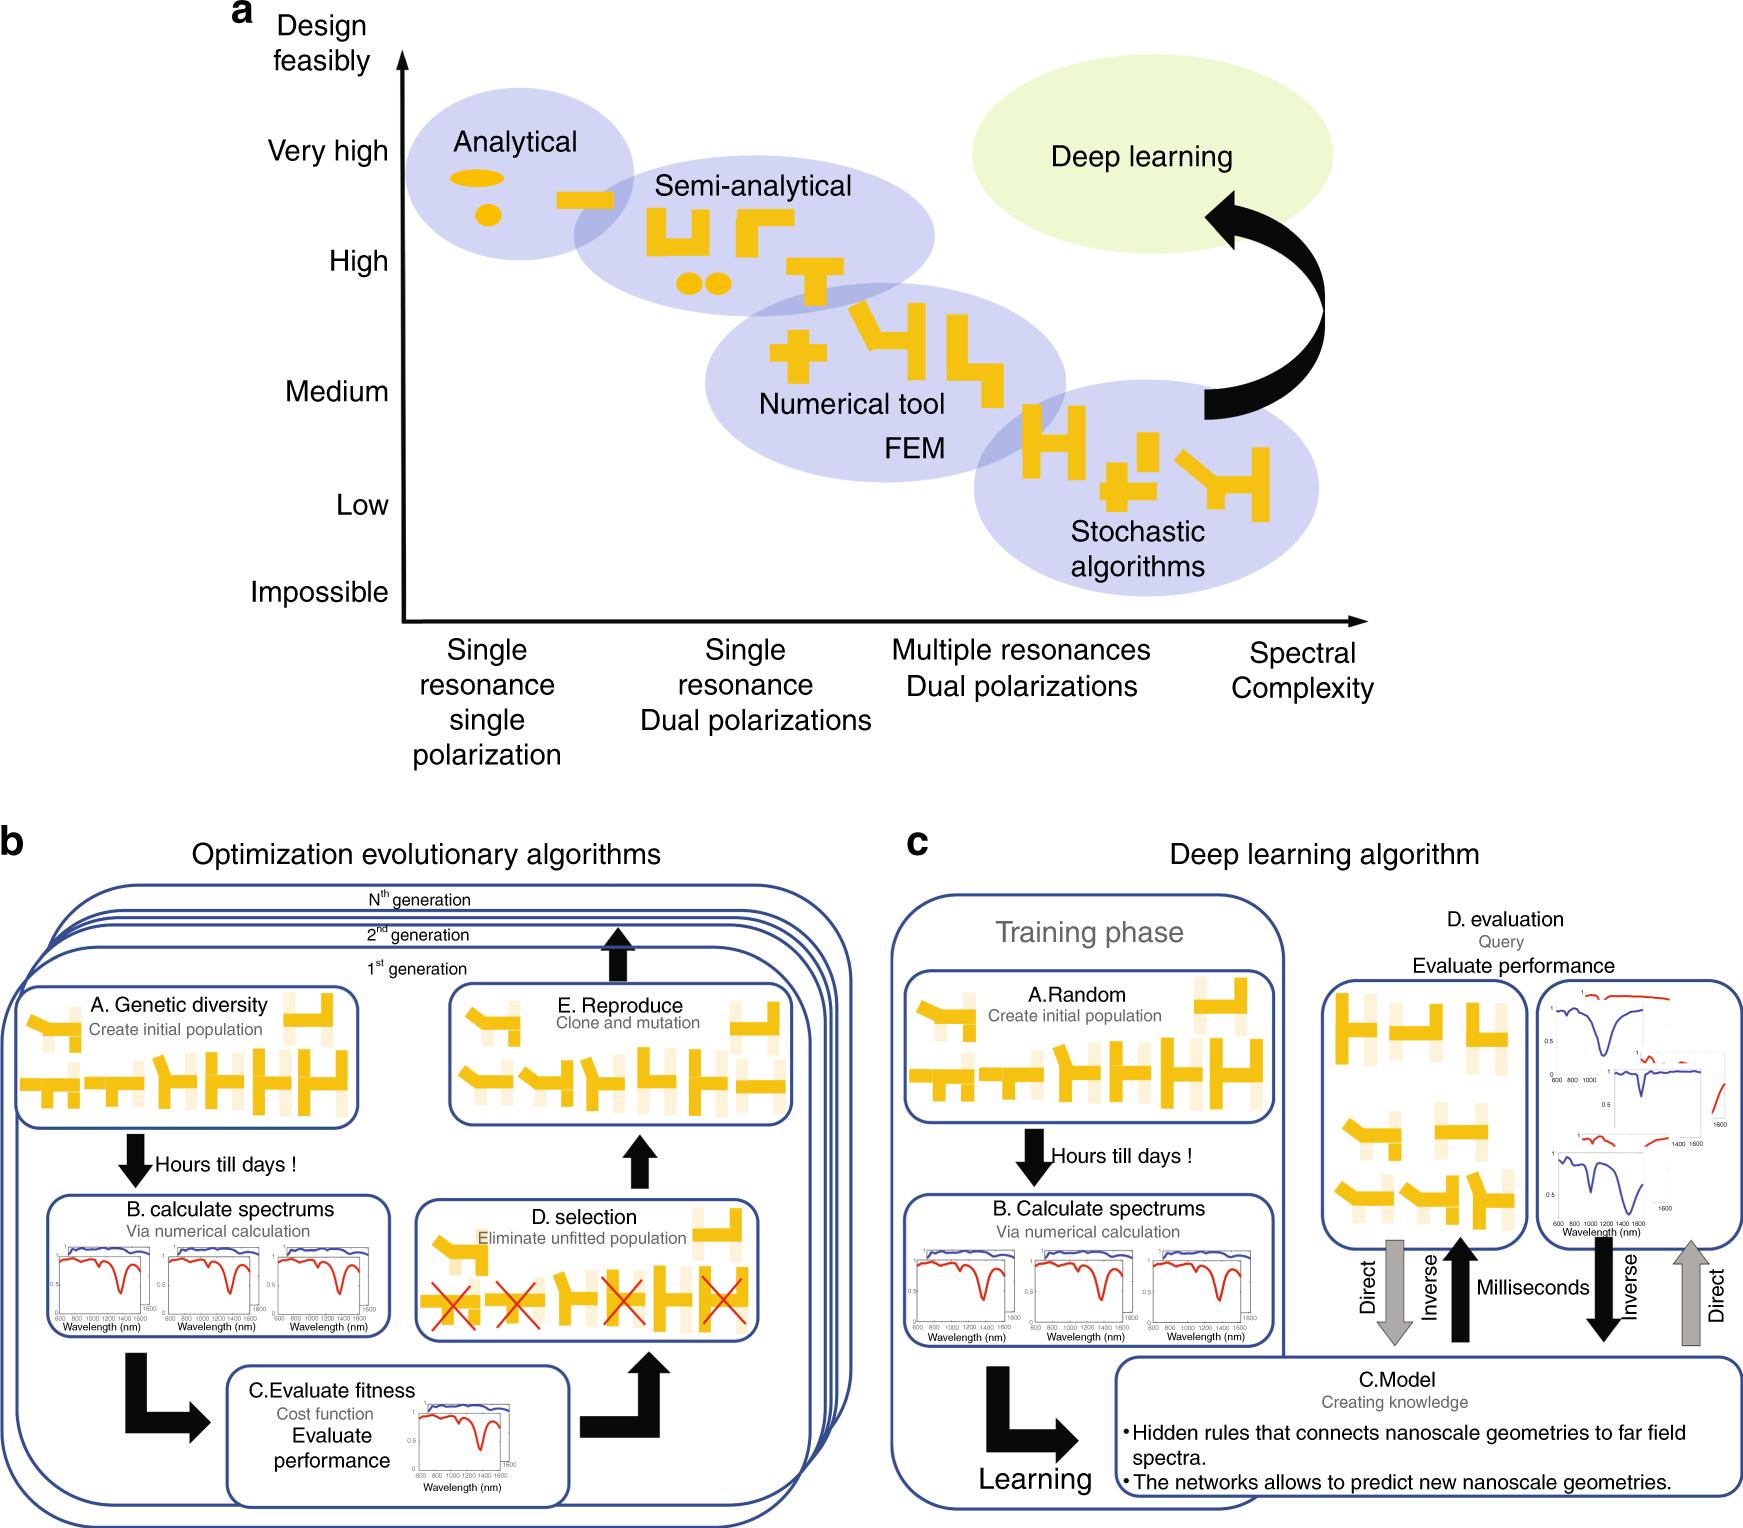 Plasmonic nanostructure design and characterization via Deep